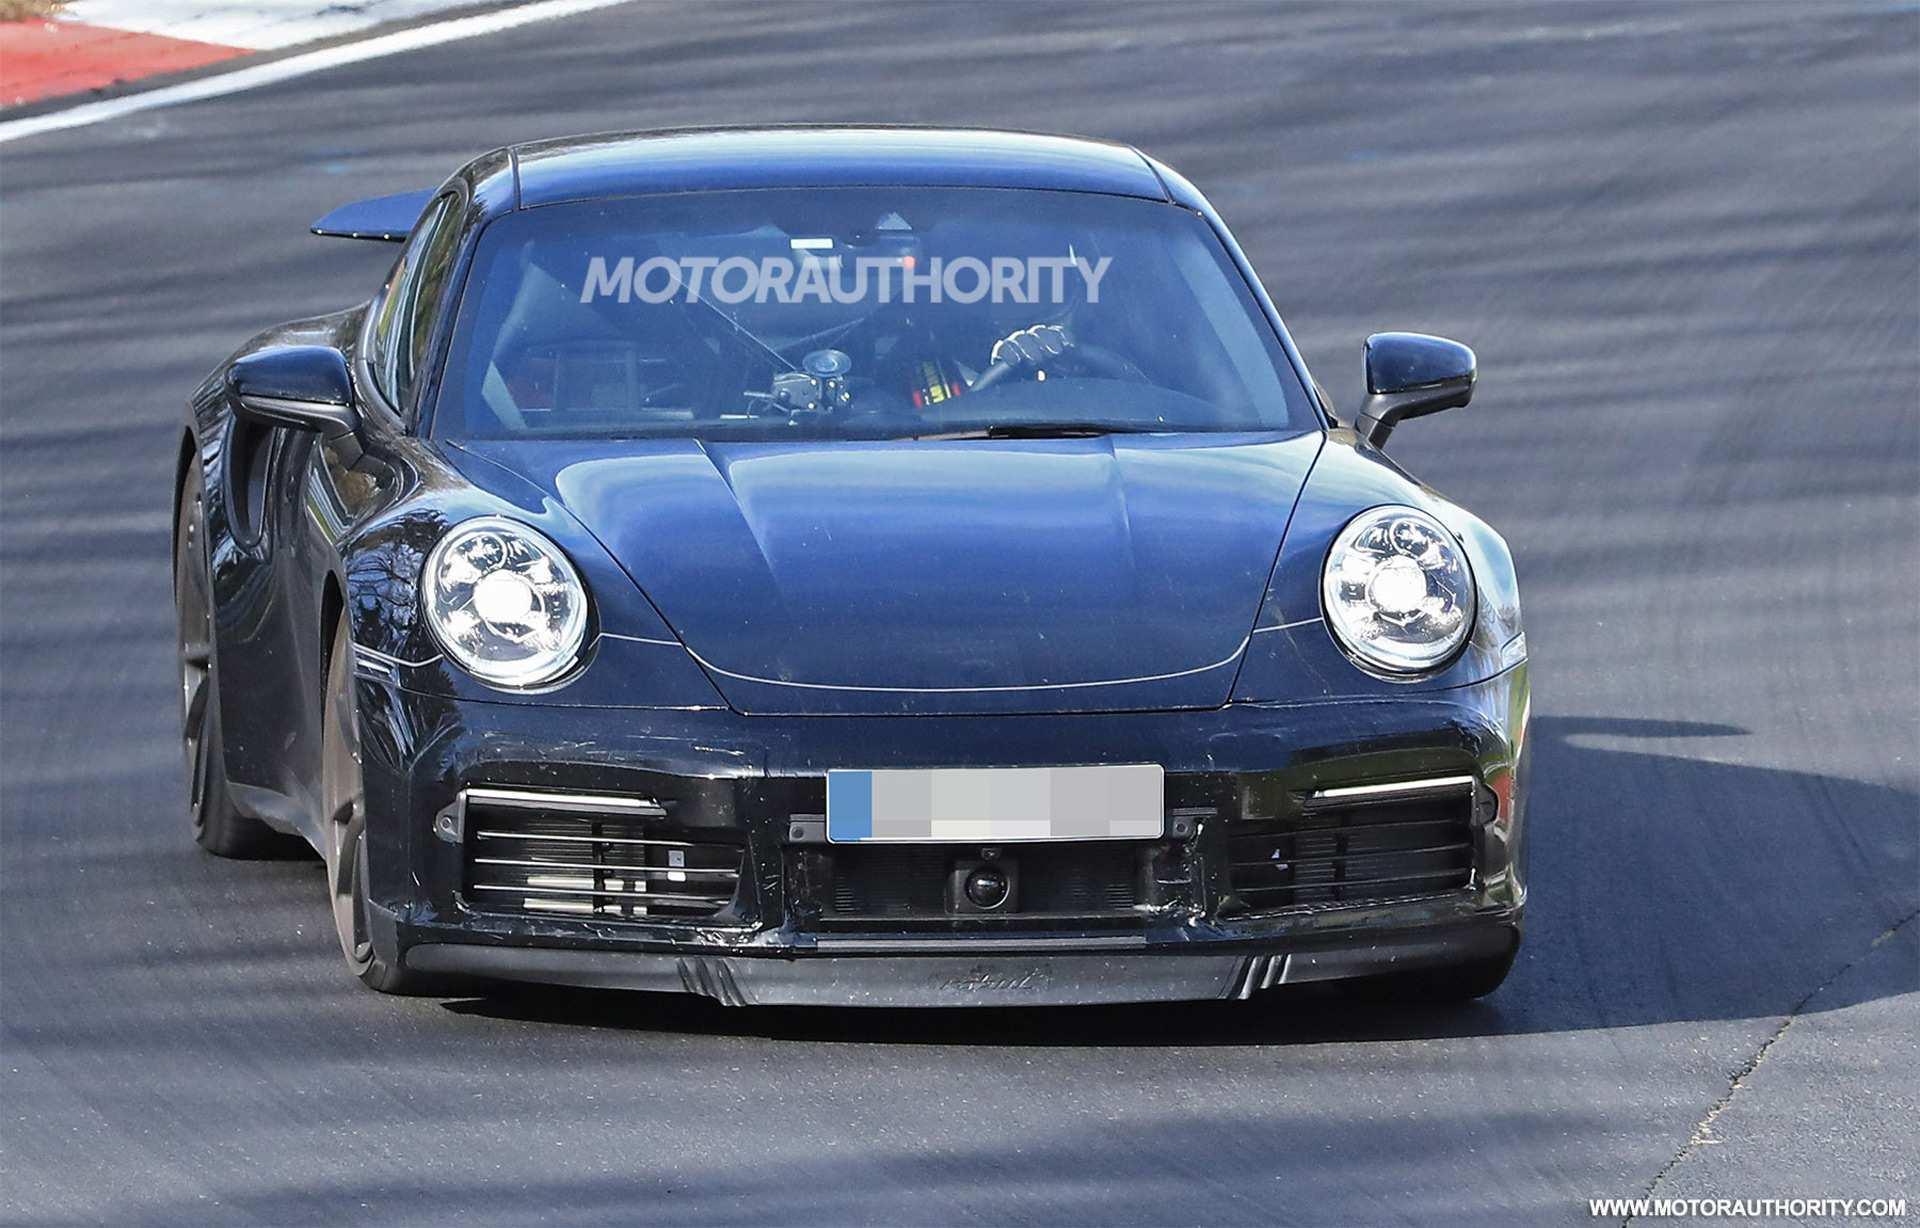 73 Concept of 2020 Porsche Turbo S Interior with 2020 Porsche Turbo S